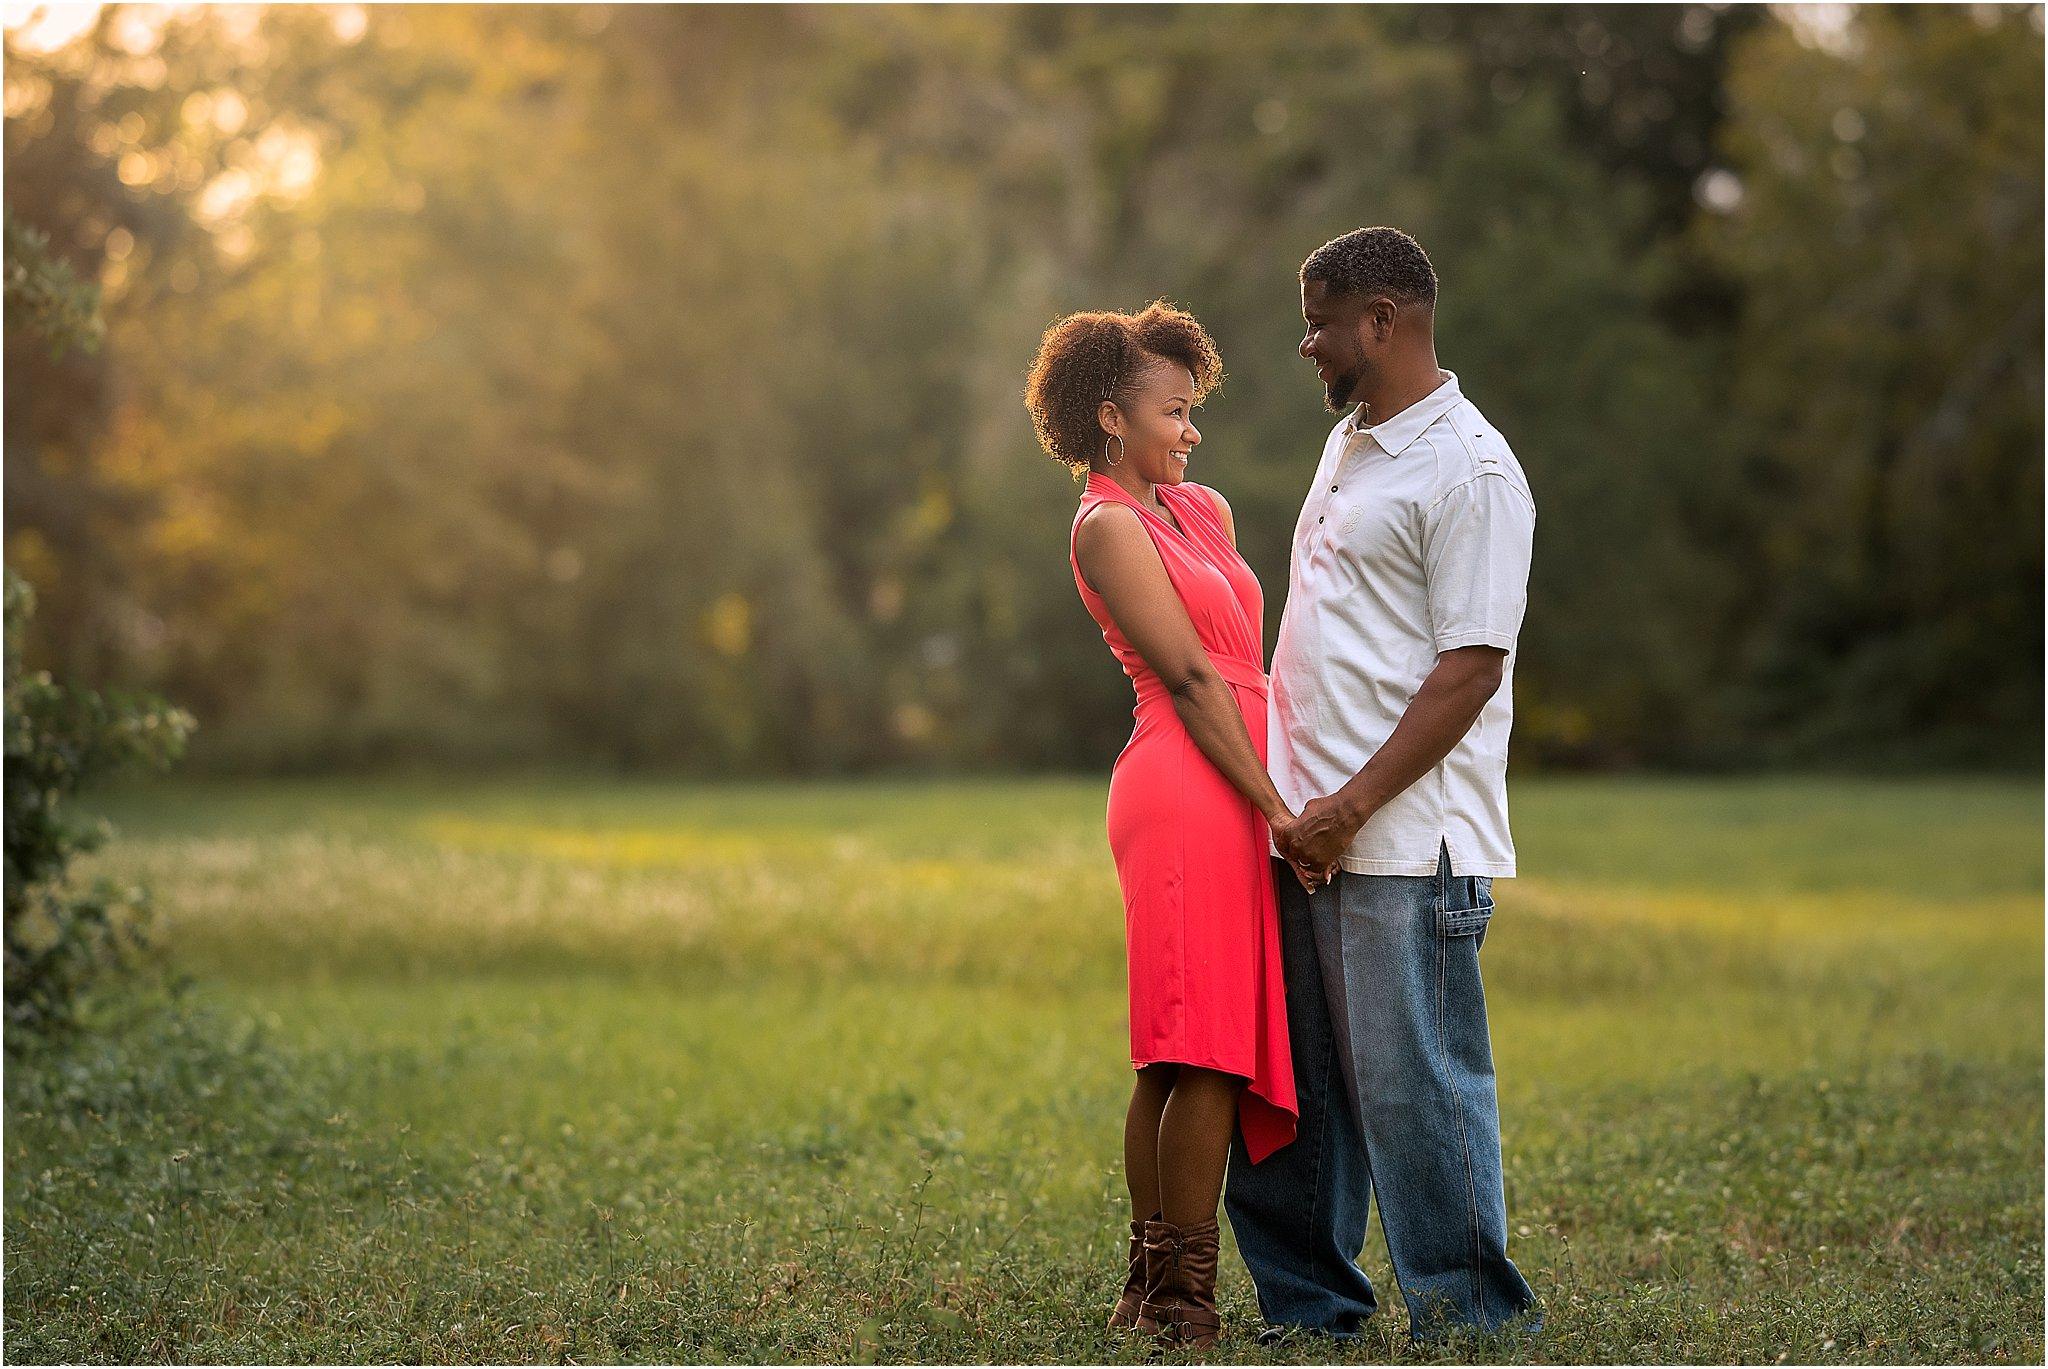 Ashley_Rogers_Photography_Orlando_Non-Posed_Newborn_Family_Lifestyle_Photographer_0647.jpg